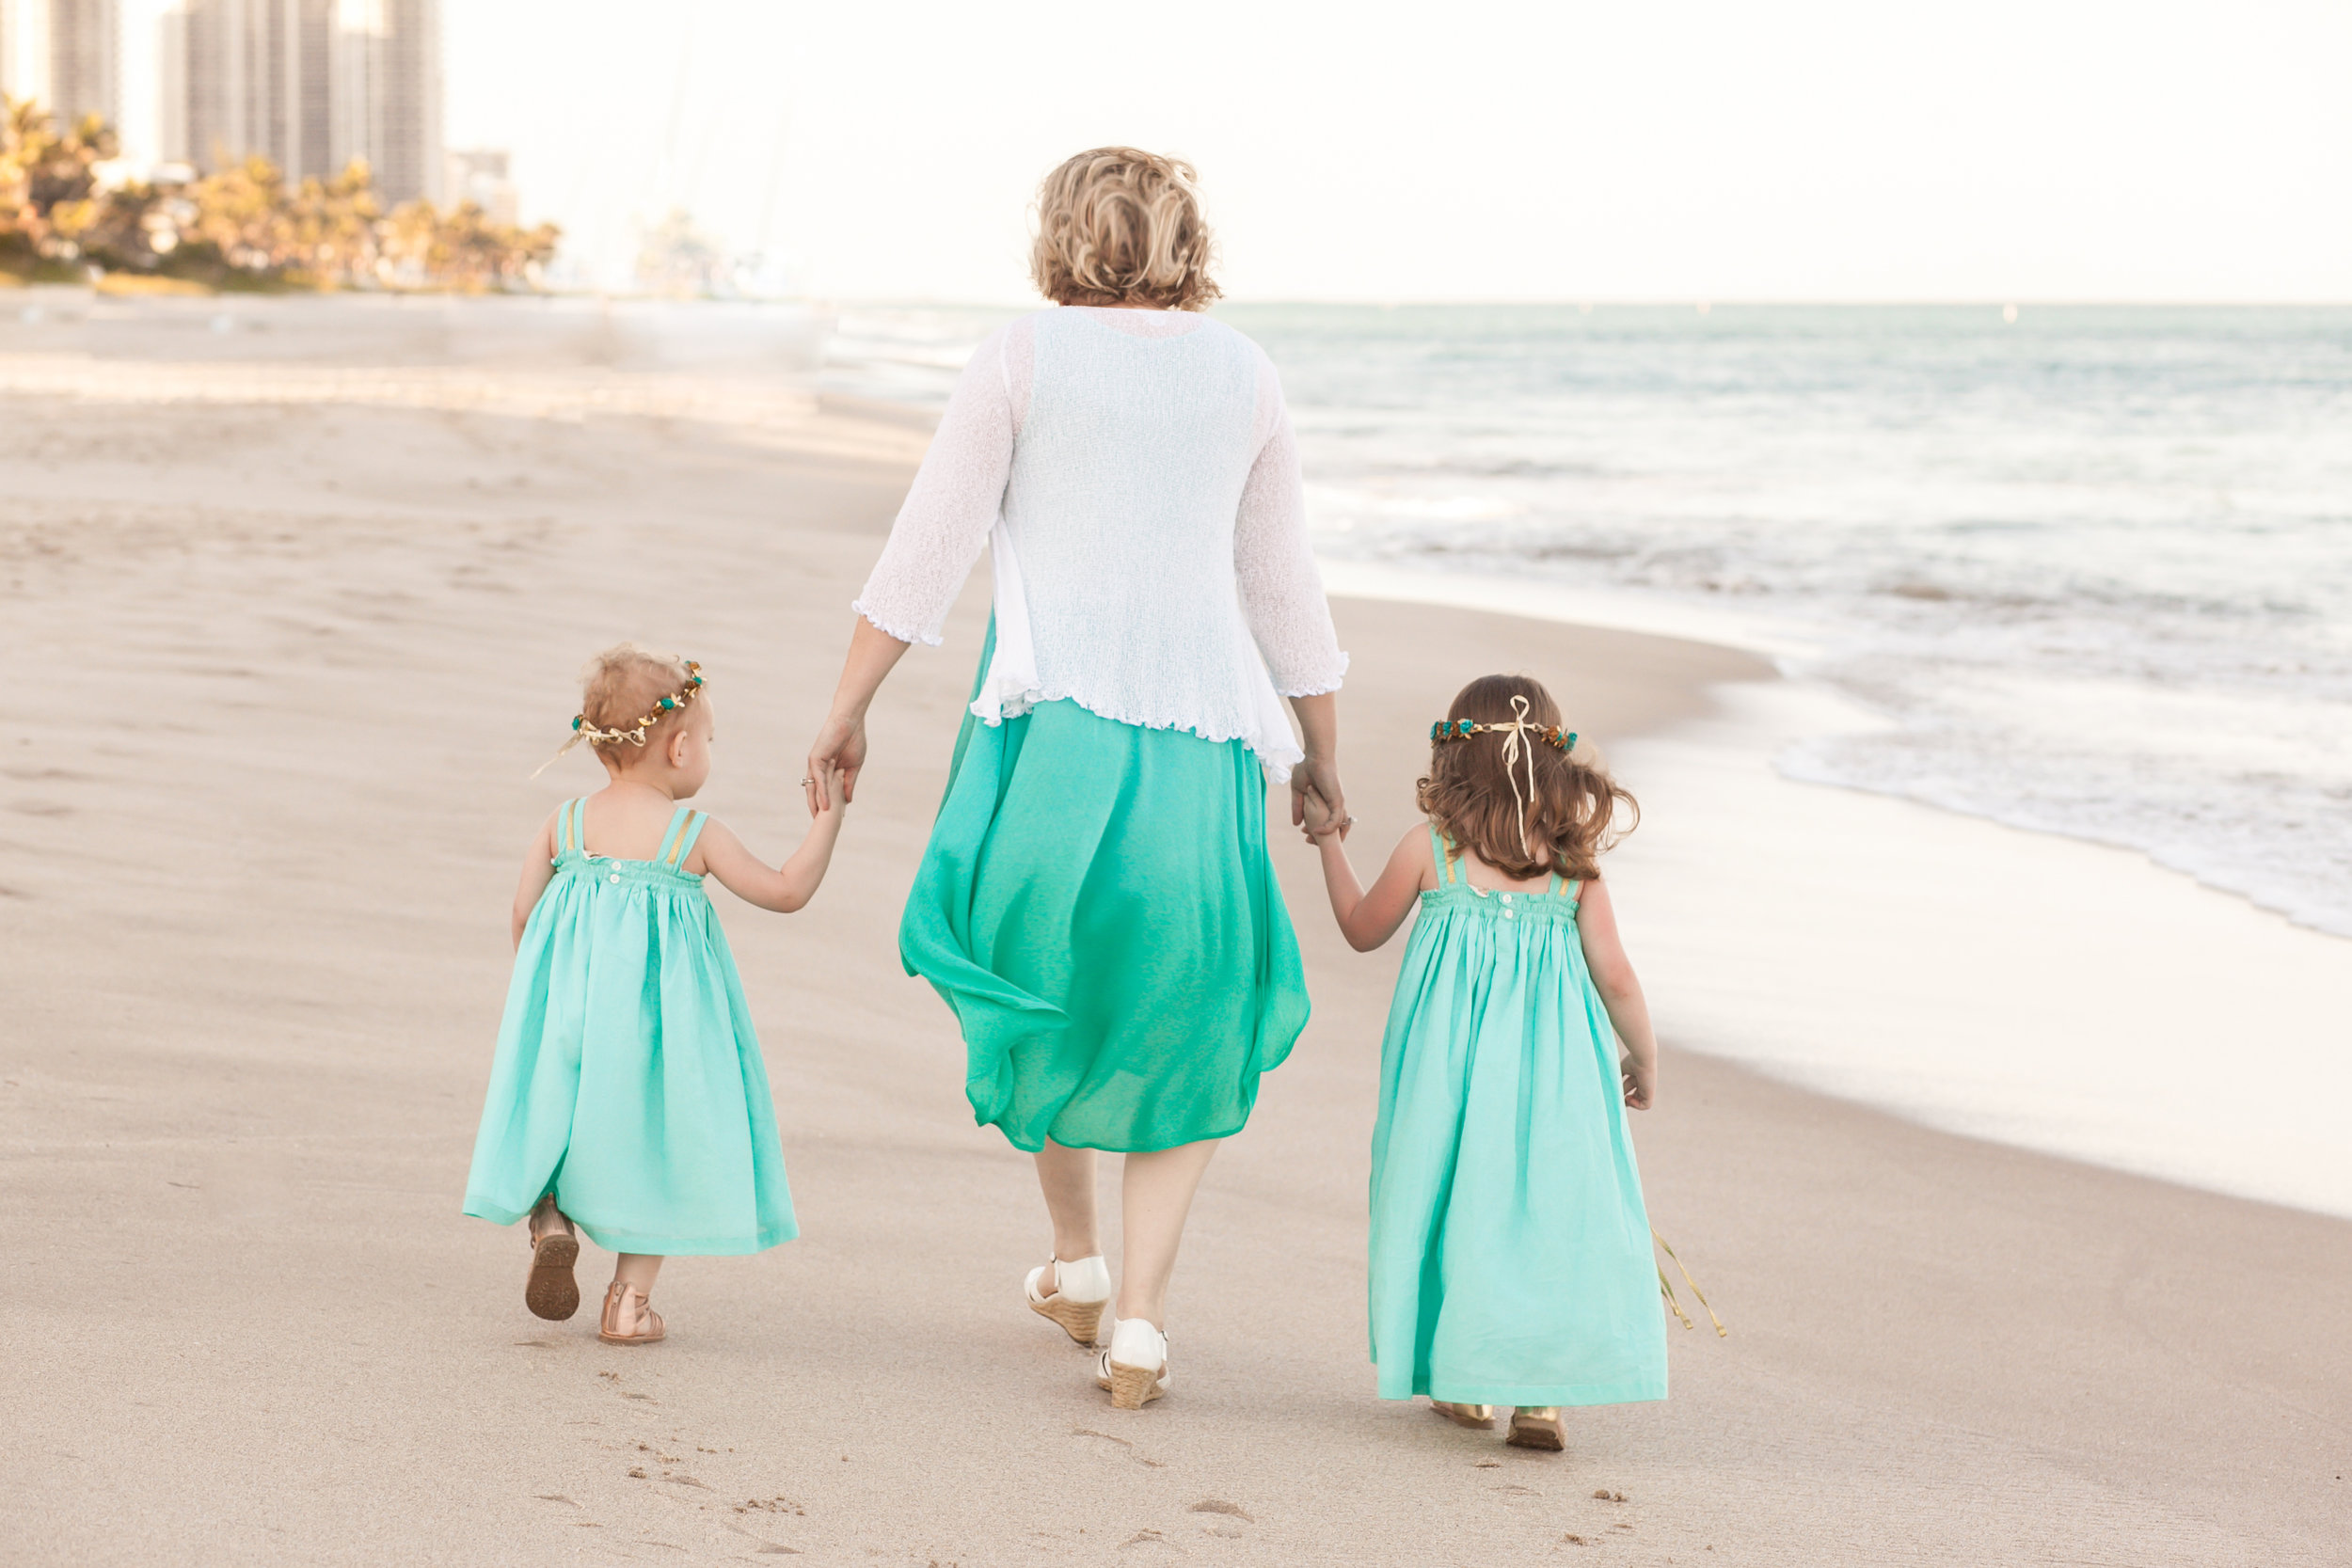 Girls-Miami-beach-teal-dress-1-2.jpg